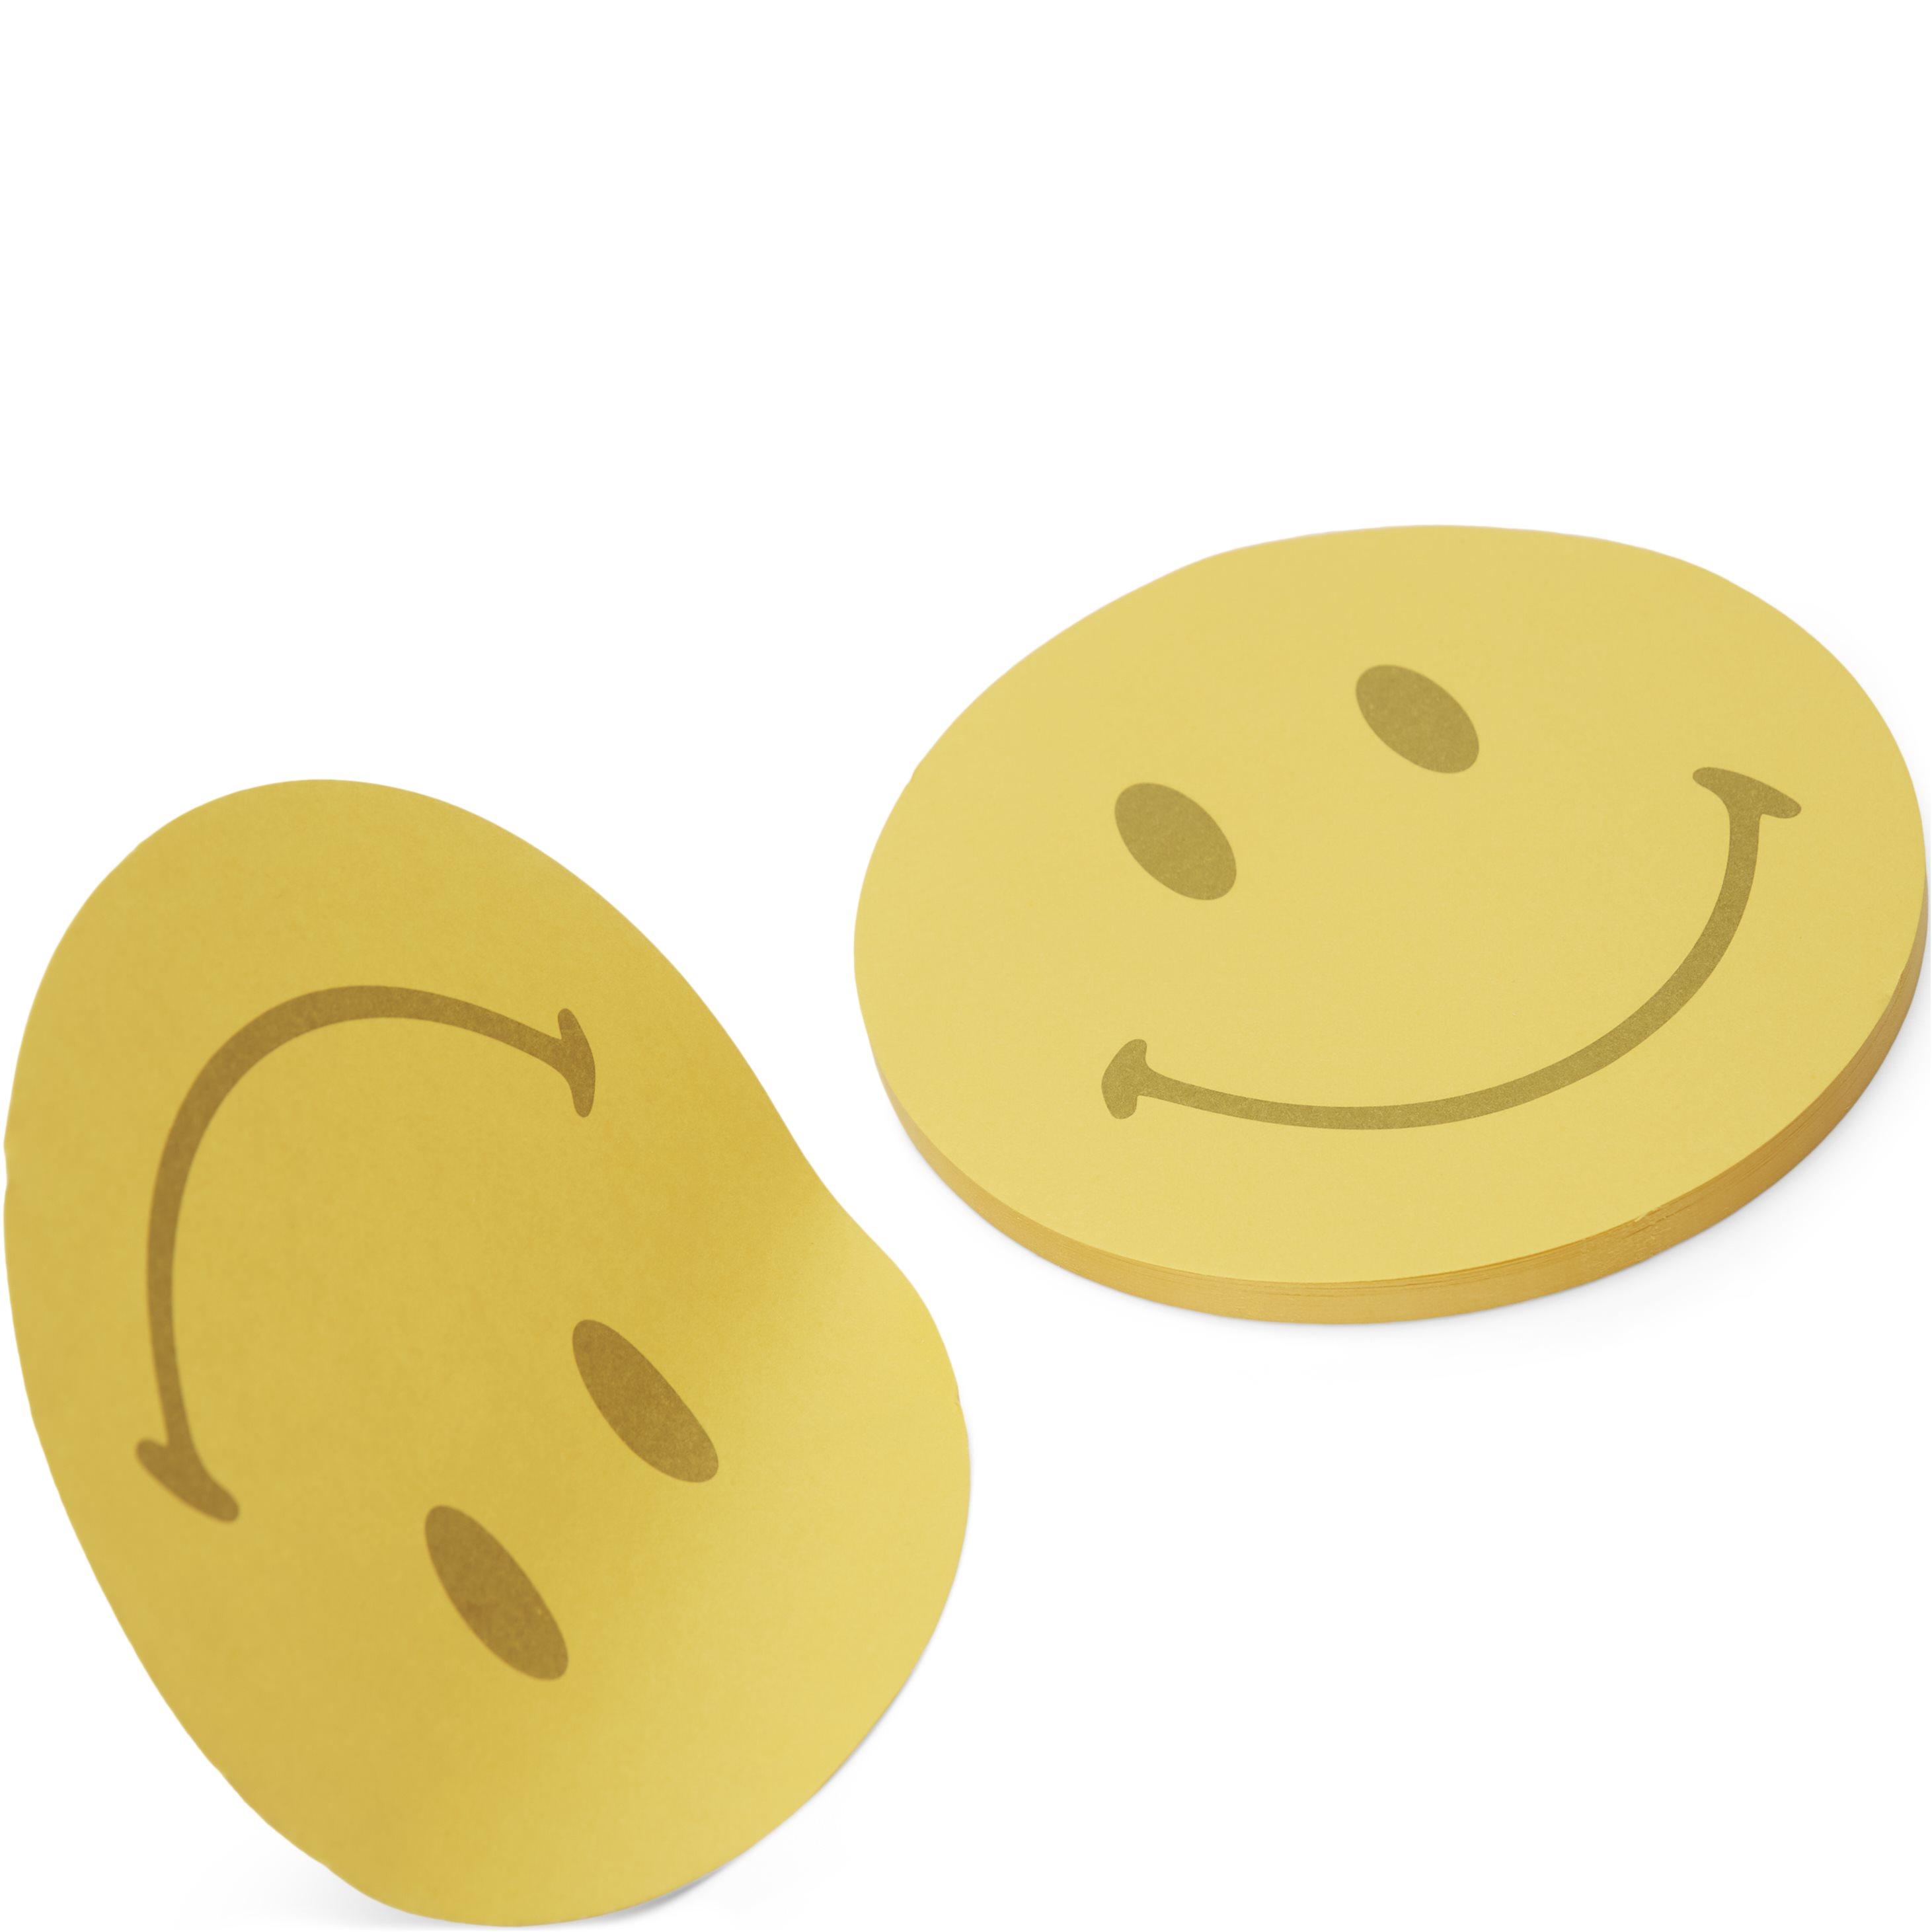 Smiley Post It Note Pad  - Accessoarer - Gul